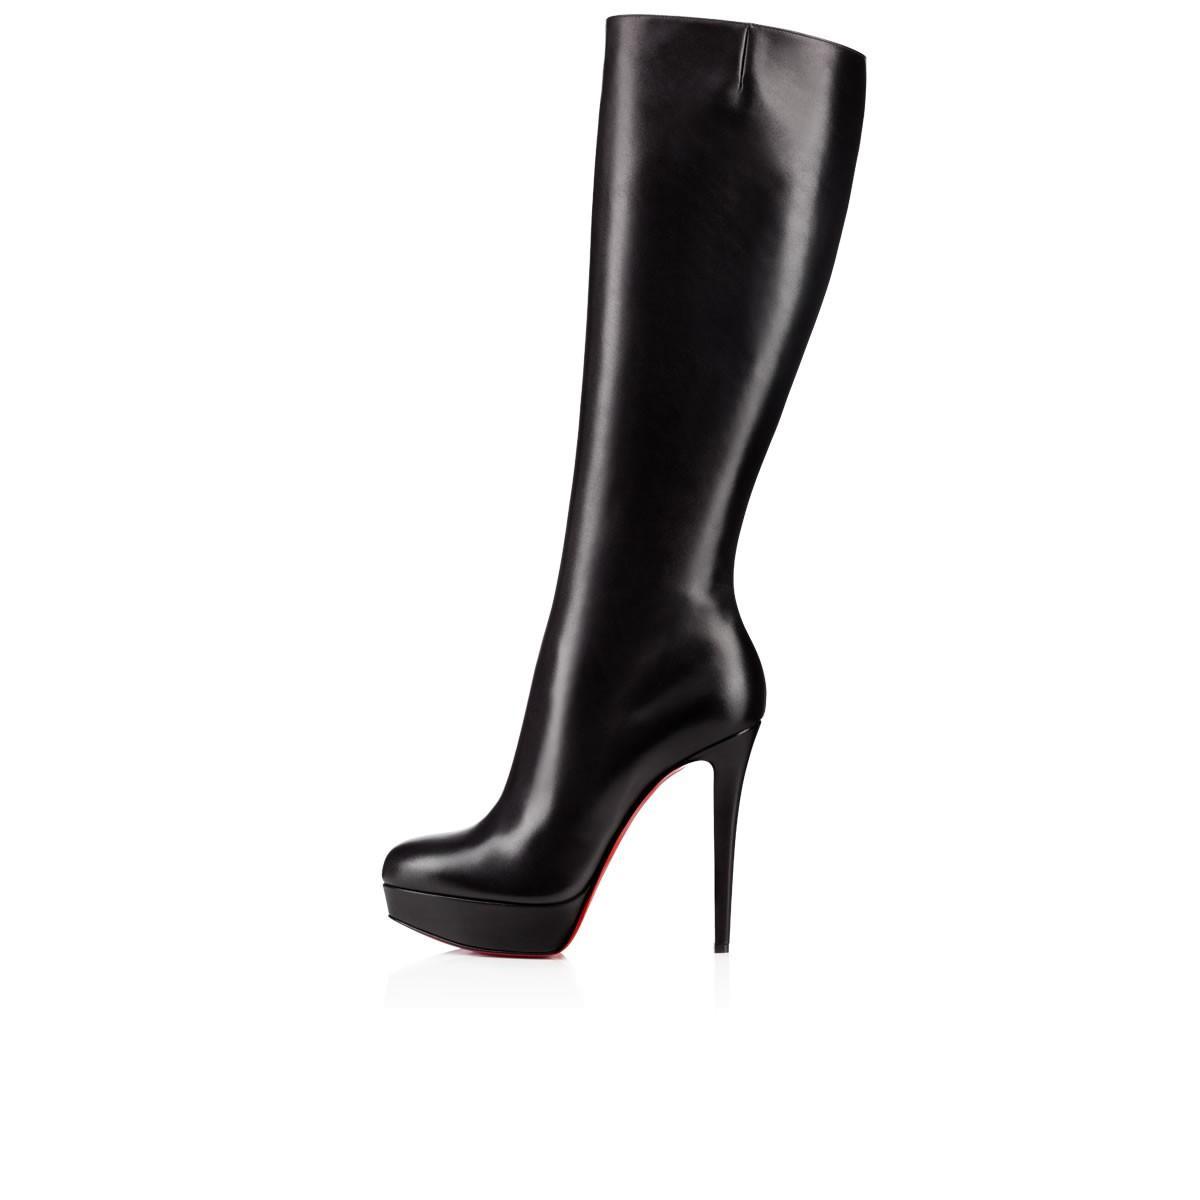 2824f2d0e67 Bianca Botta Platform Red Sole Boot, Black